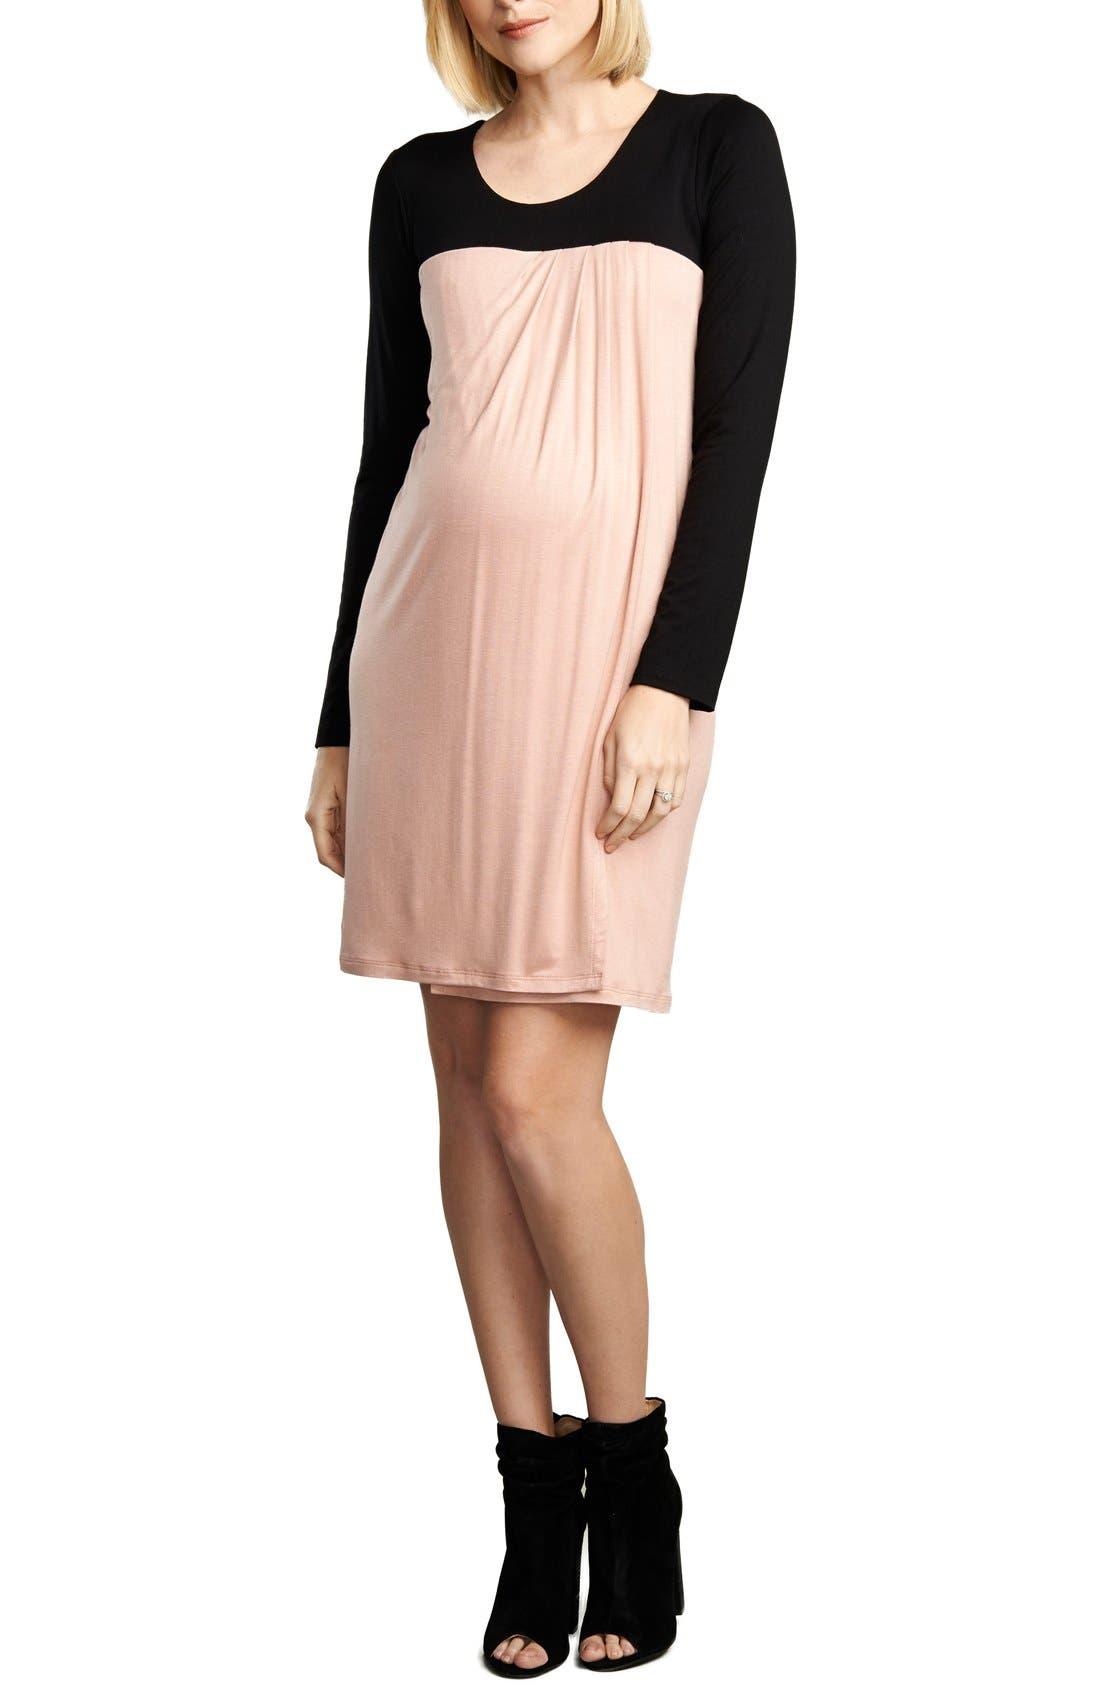 Baby Doll Maternity/Nursing Dress,                         Main,                         color, Black/Rose